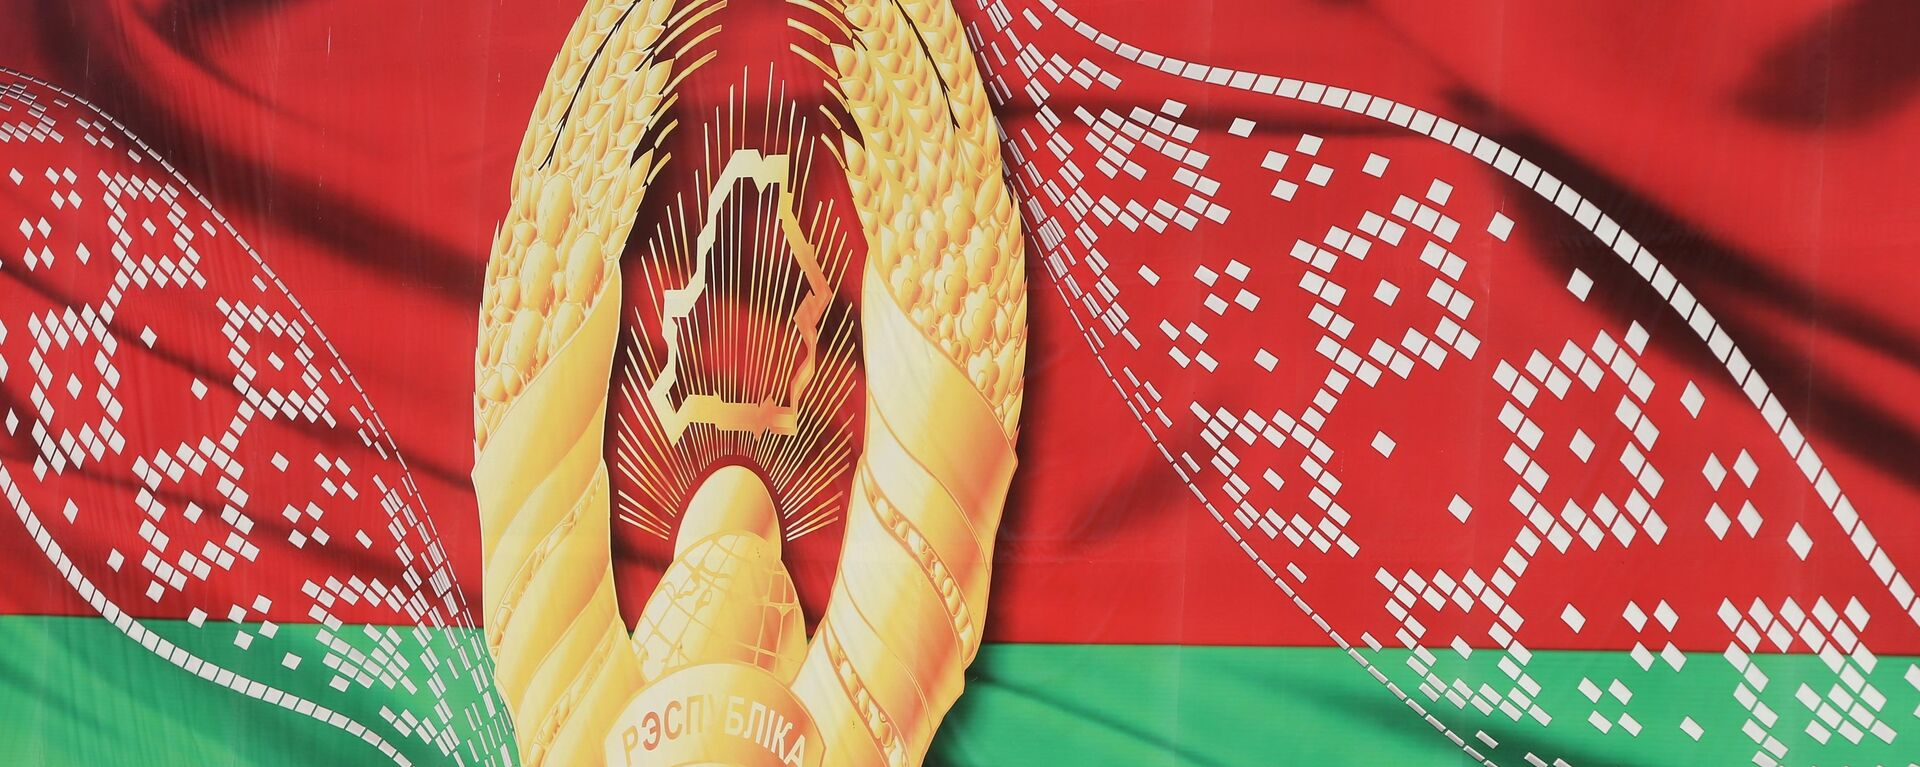 Bandera de Bielorrusia - Sputnik Mundo, 1920, 28.06.2021